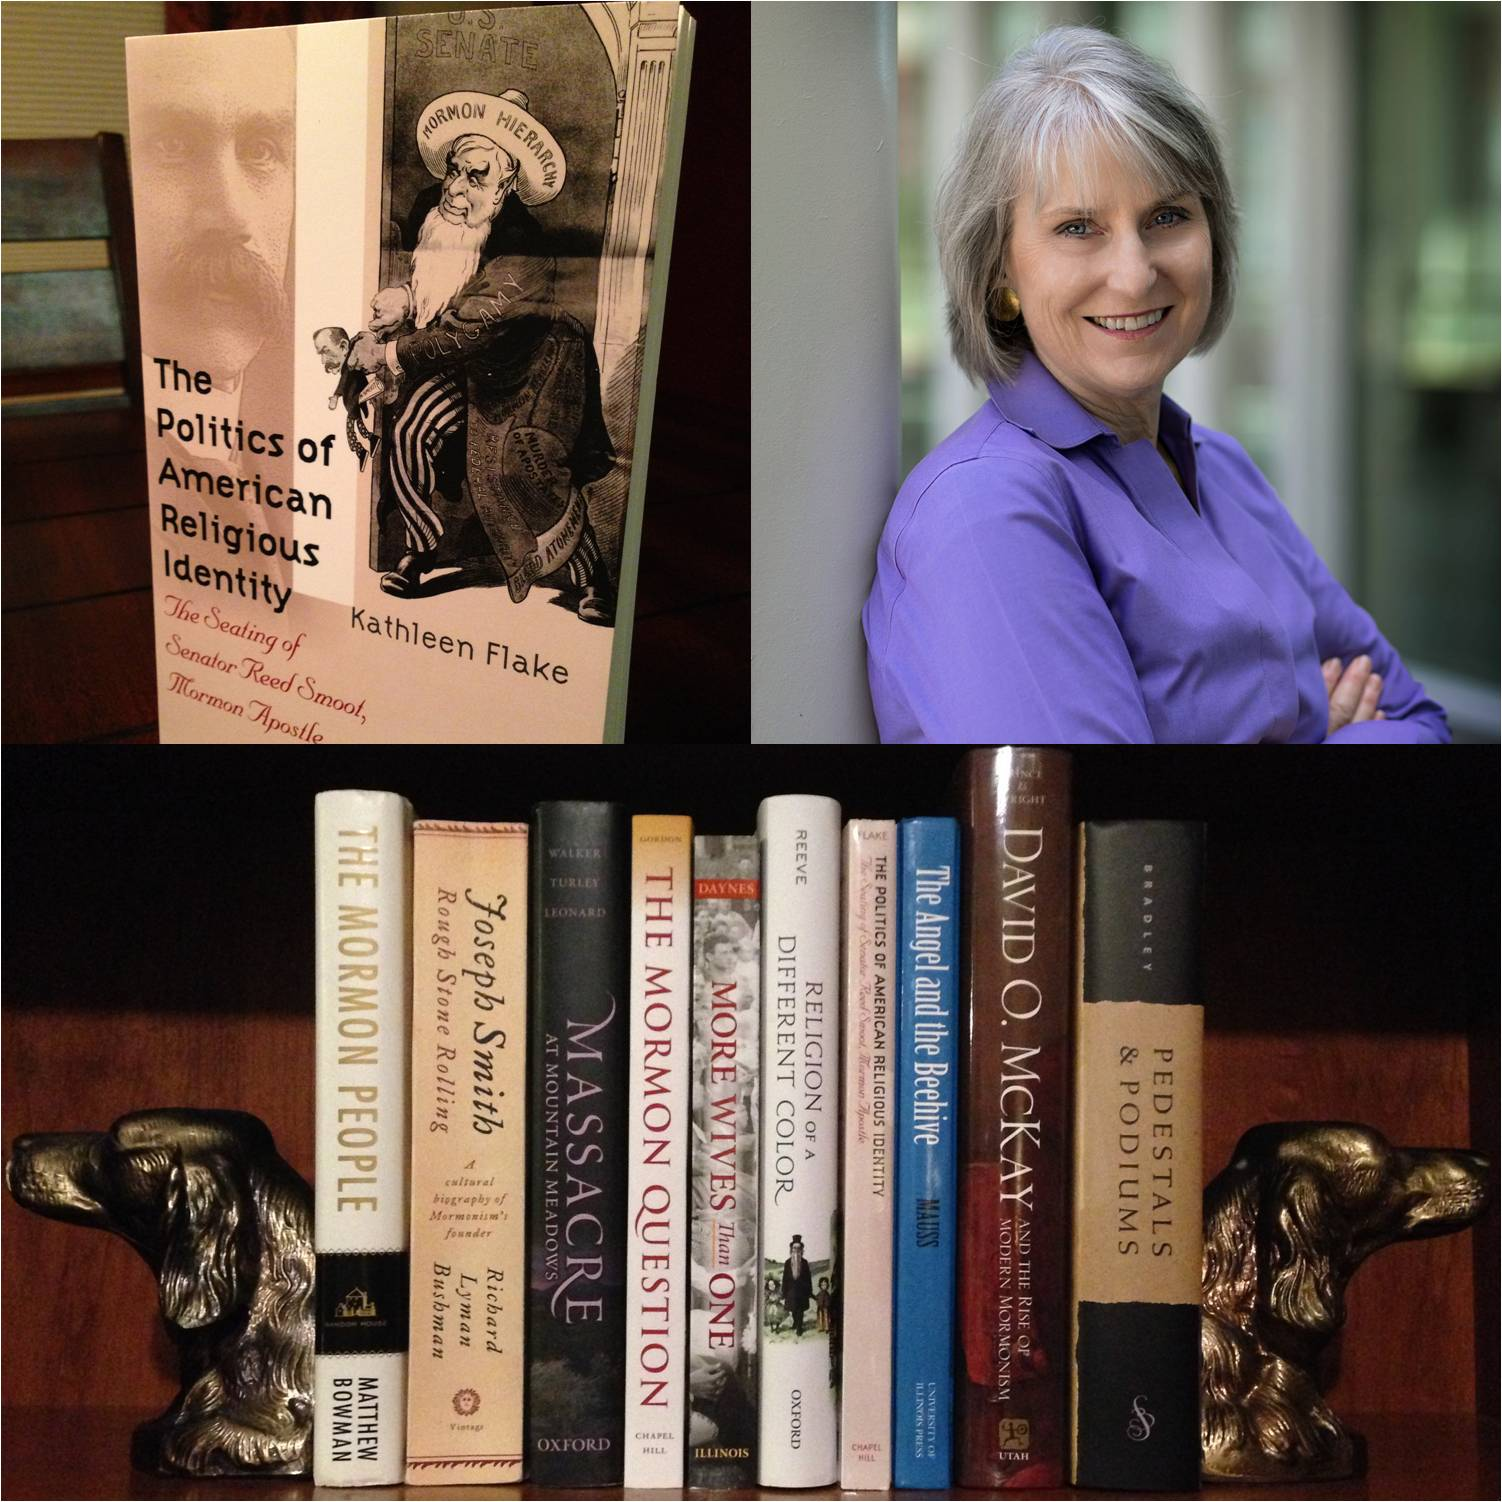 73: Top Ten Books on Mormon History – The Politics of American Religious Identity